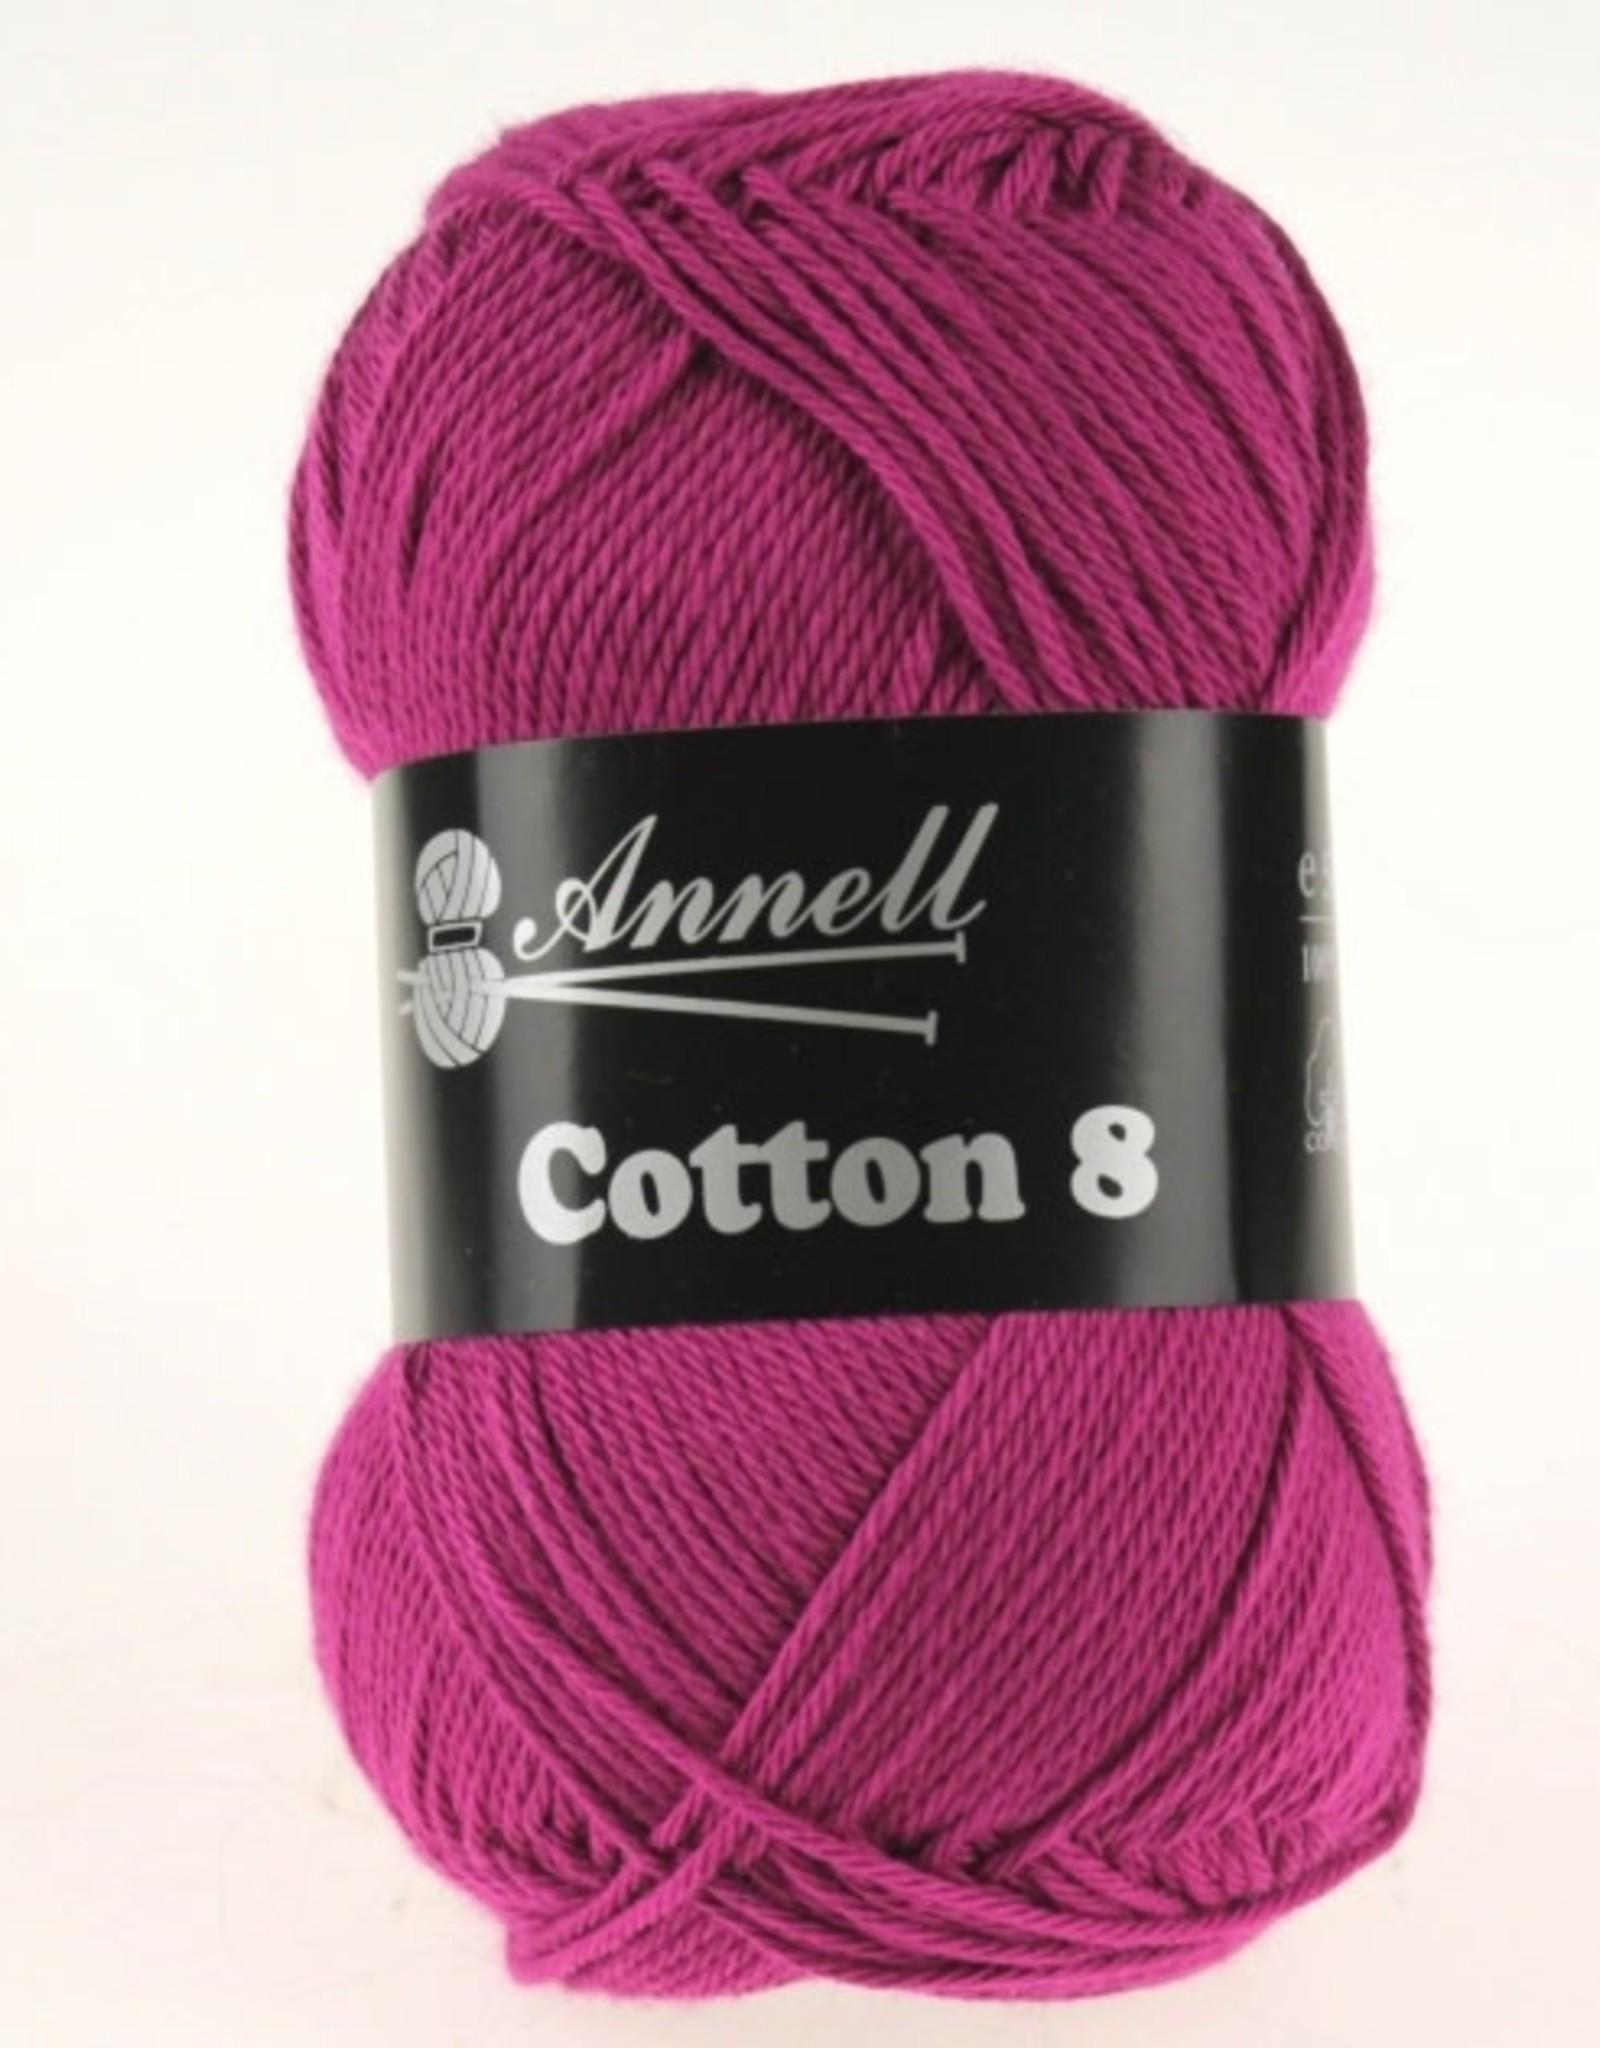 Annell Annell Cotton 8 80